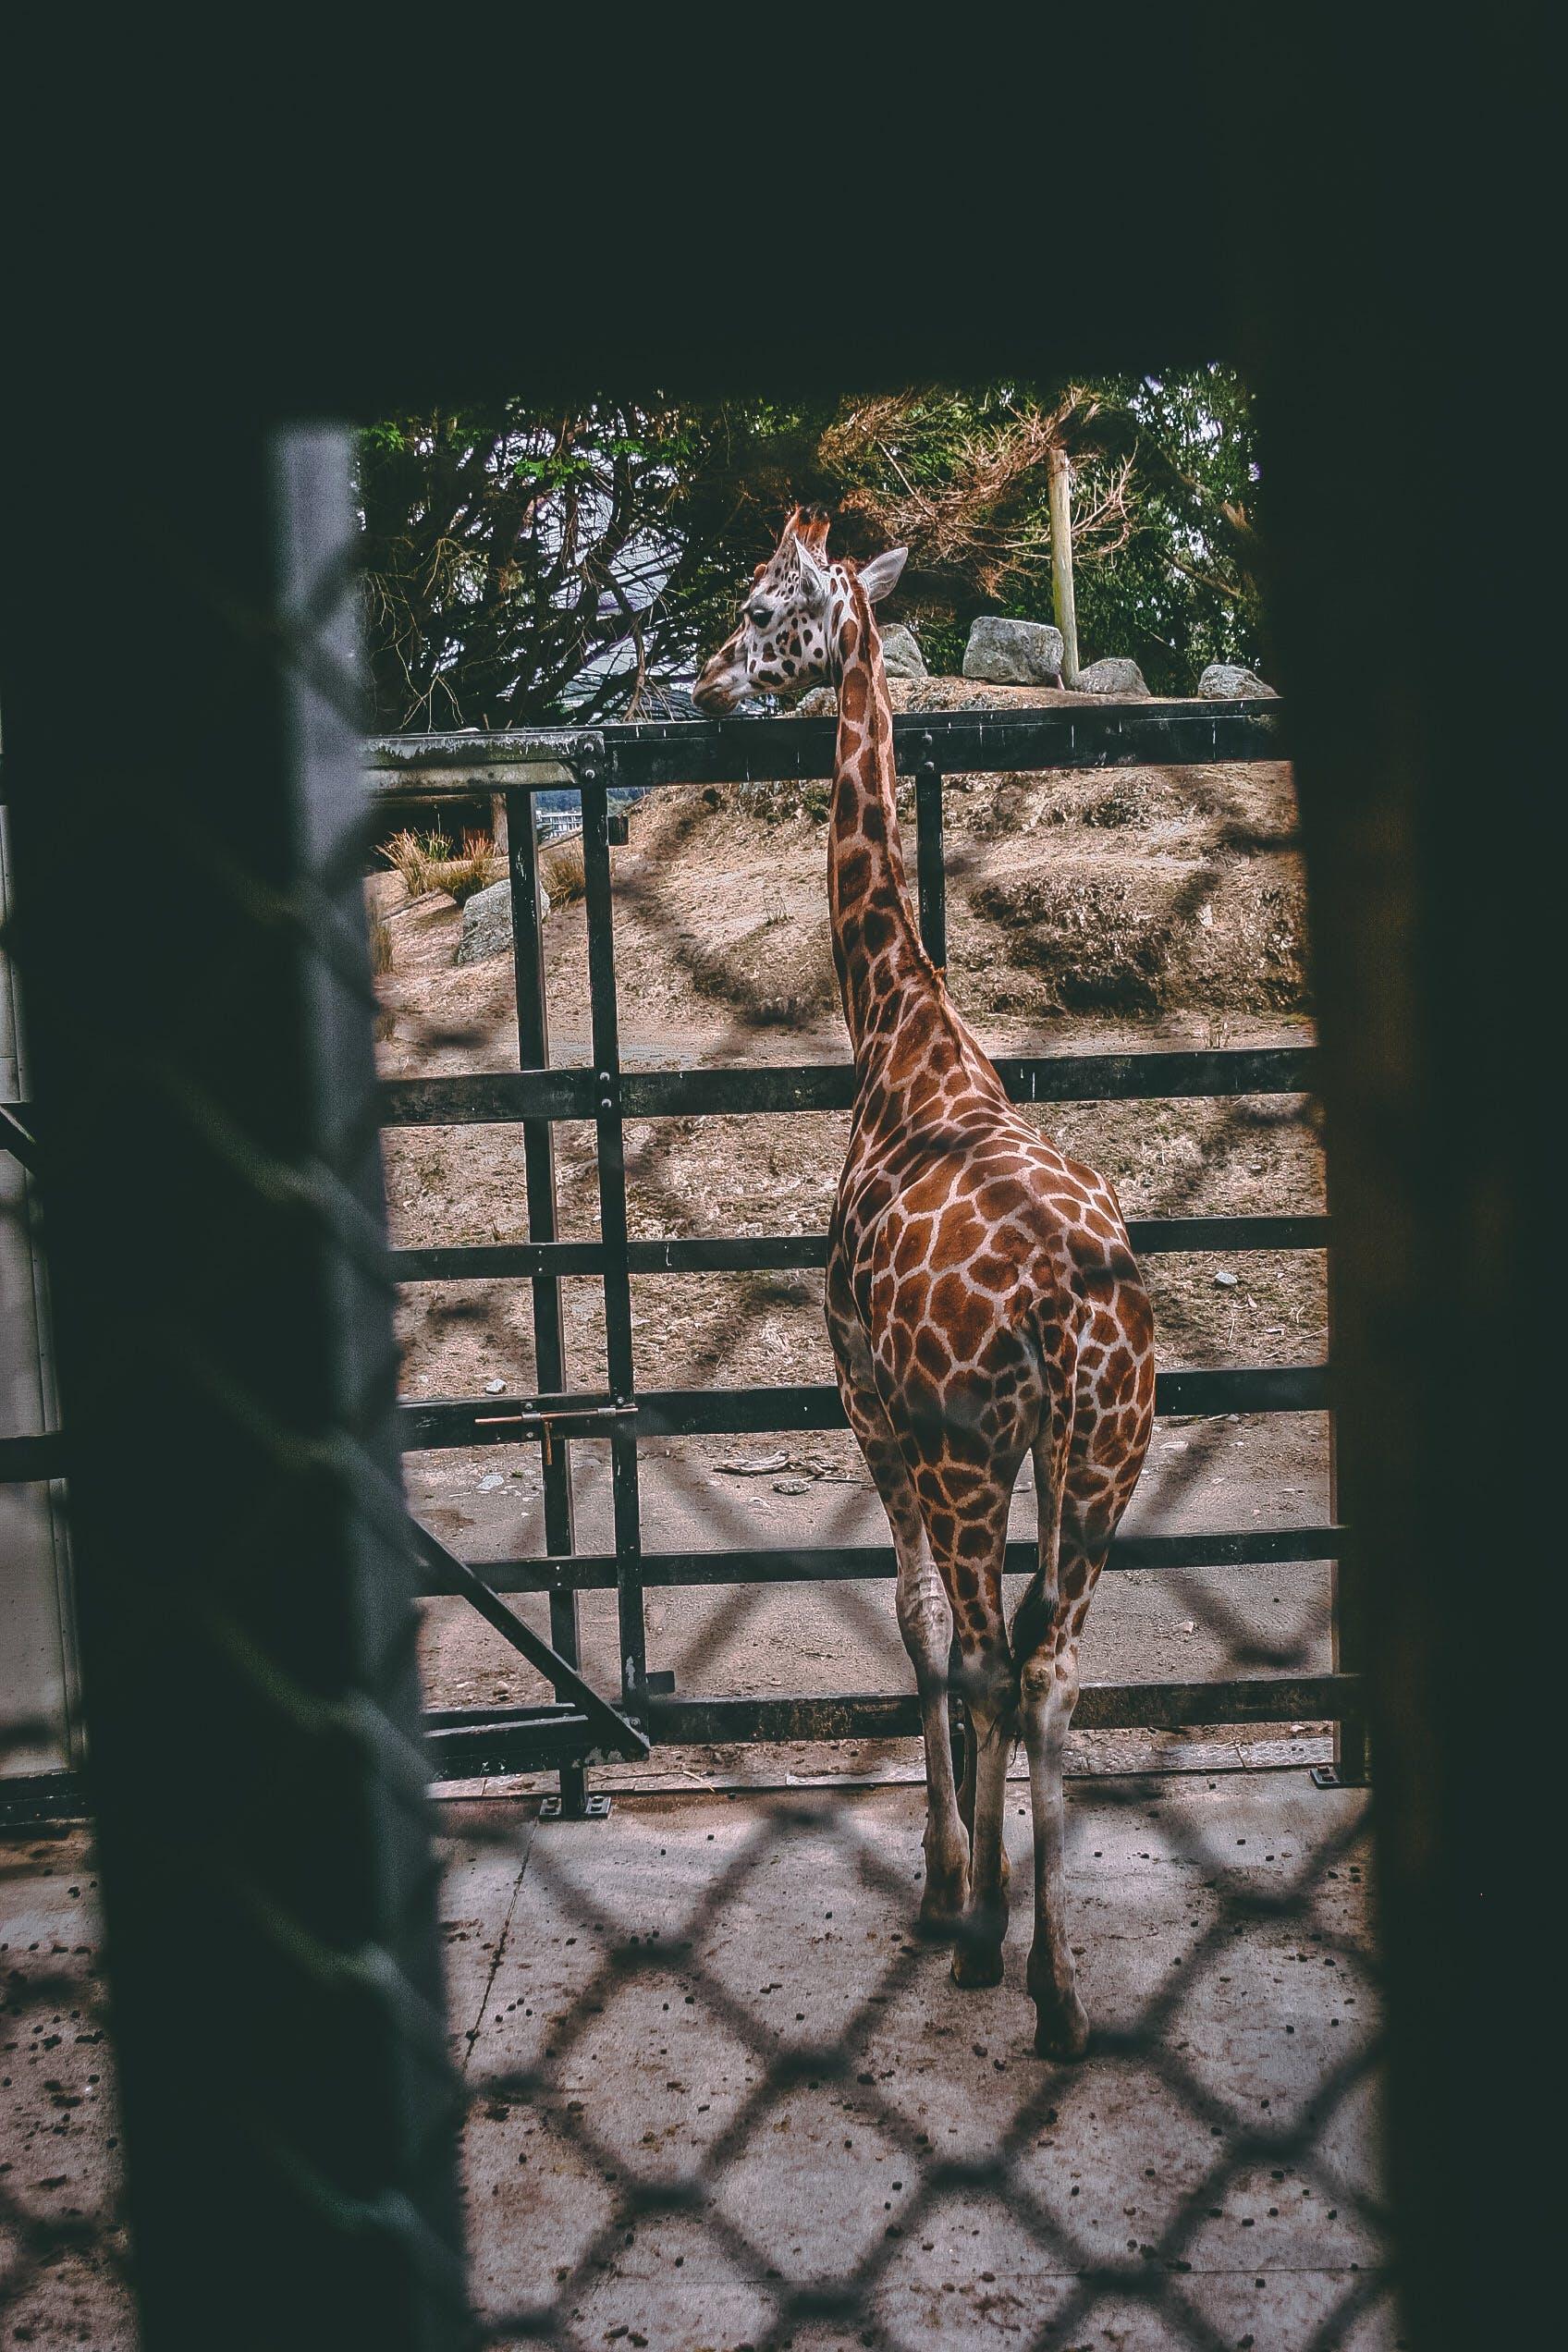 Brown and Beige Giraffe Standing Near Black Metal Fence